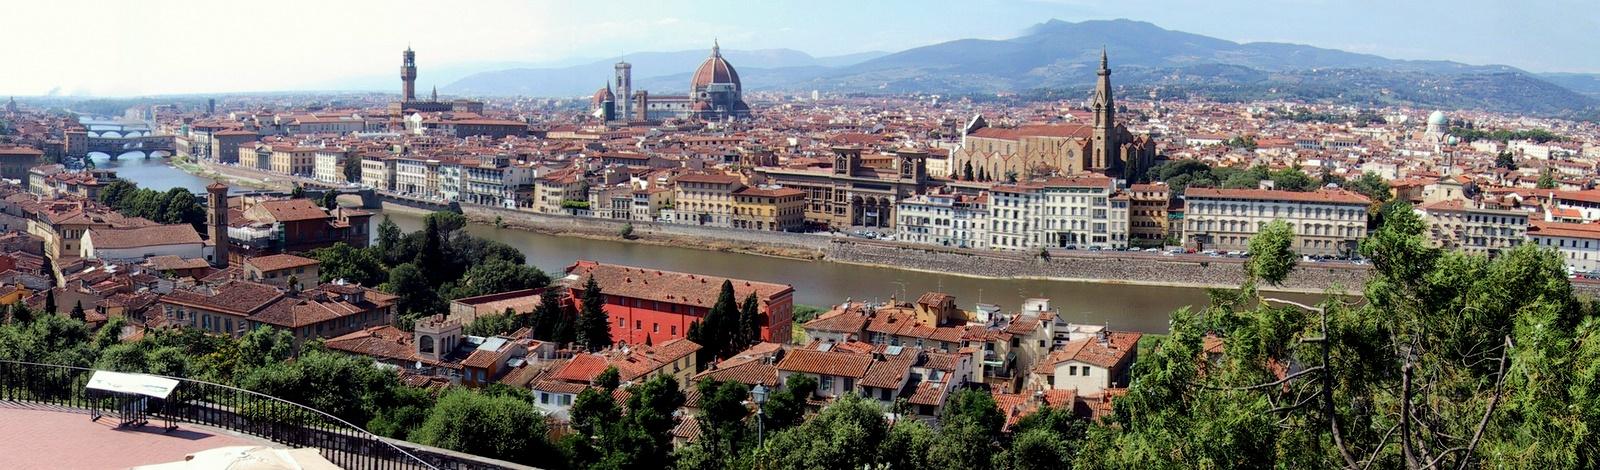 Florence Panorama Michaelangelo